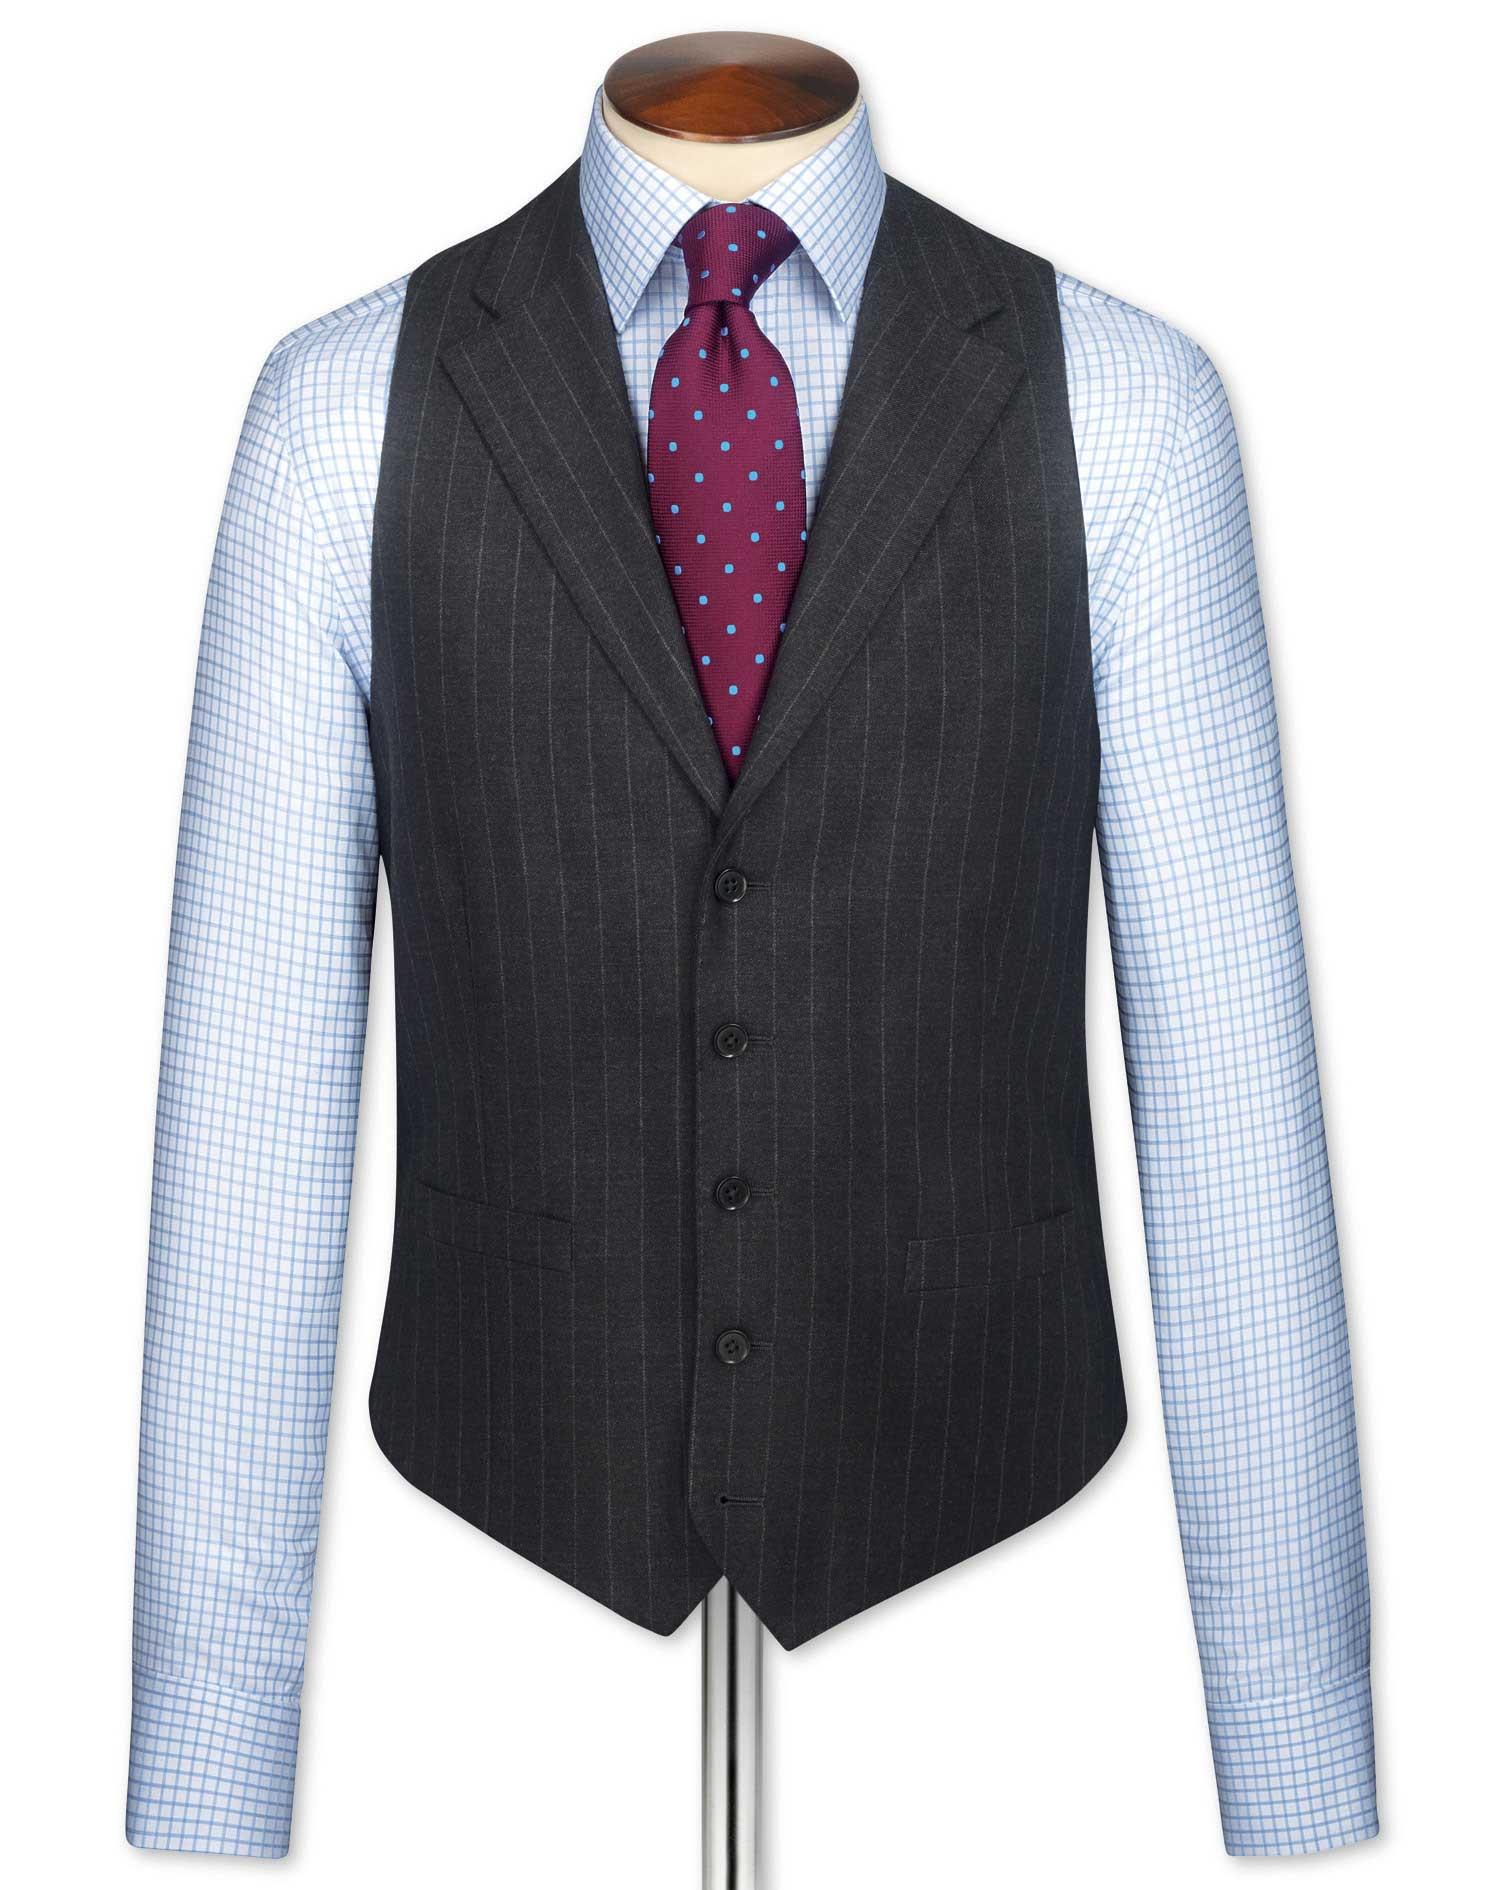 Charcoal Saxony Business Suit Wool Waistcoat Size w36 by Charles Tyrwhitt